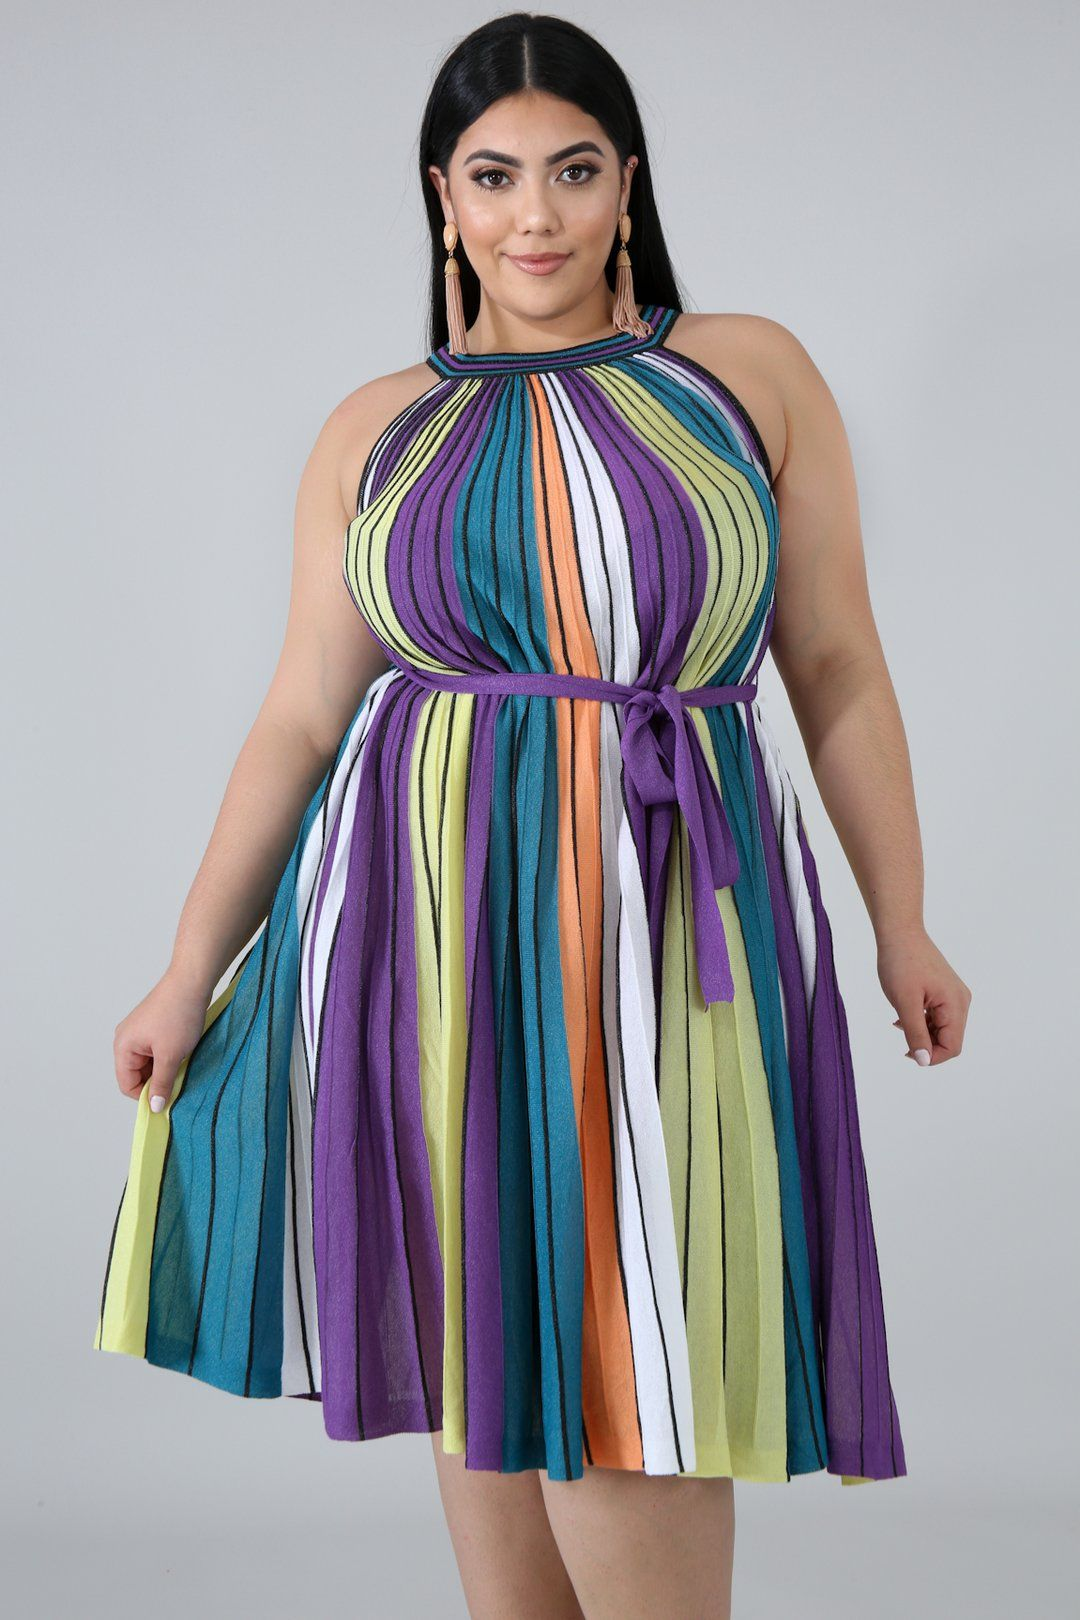 Metallic Stripe Maxi Dress Style 50743 Xdescriptionthis Rainbow Pleated Maxi Dress Features A Stretchy Fabr Striped Maxi Dresses Maxi Dress Style Maxi Dress [ 1620 x 1080 Pixel ]